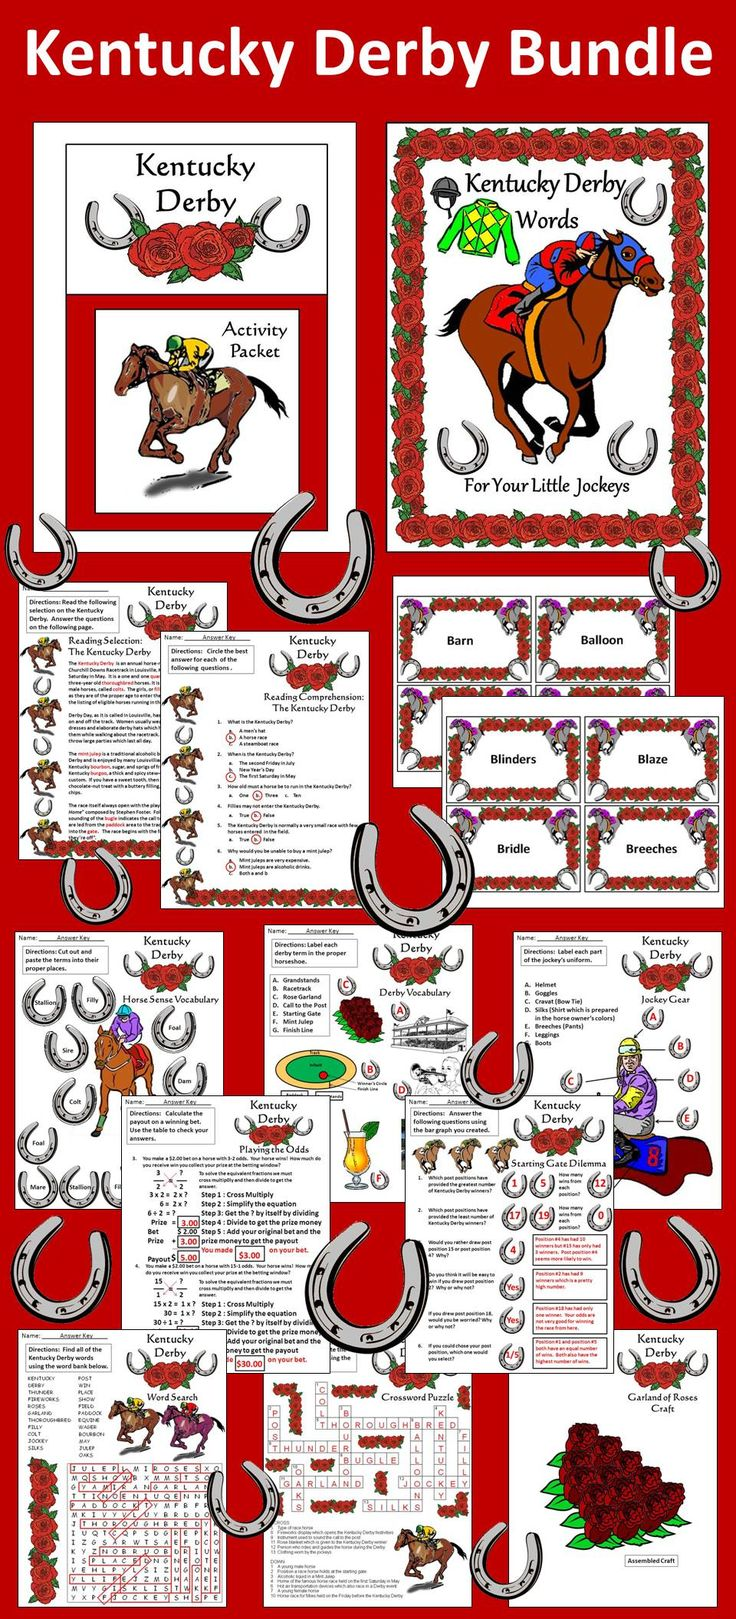 kentucky derby party betting games fiesta sportsbook